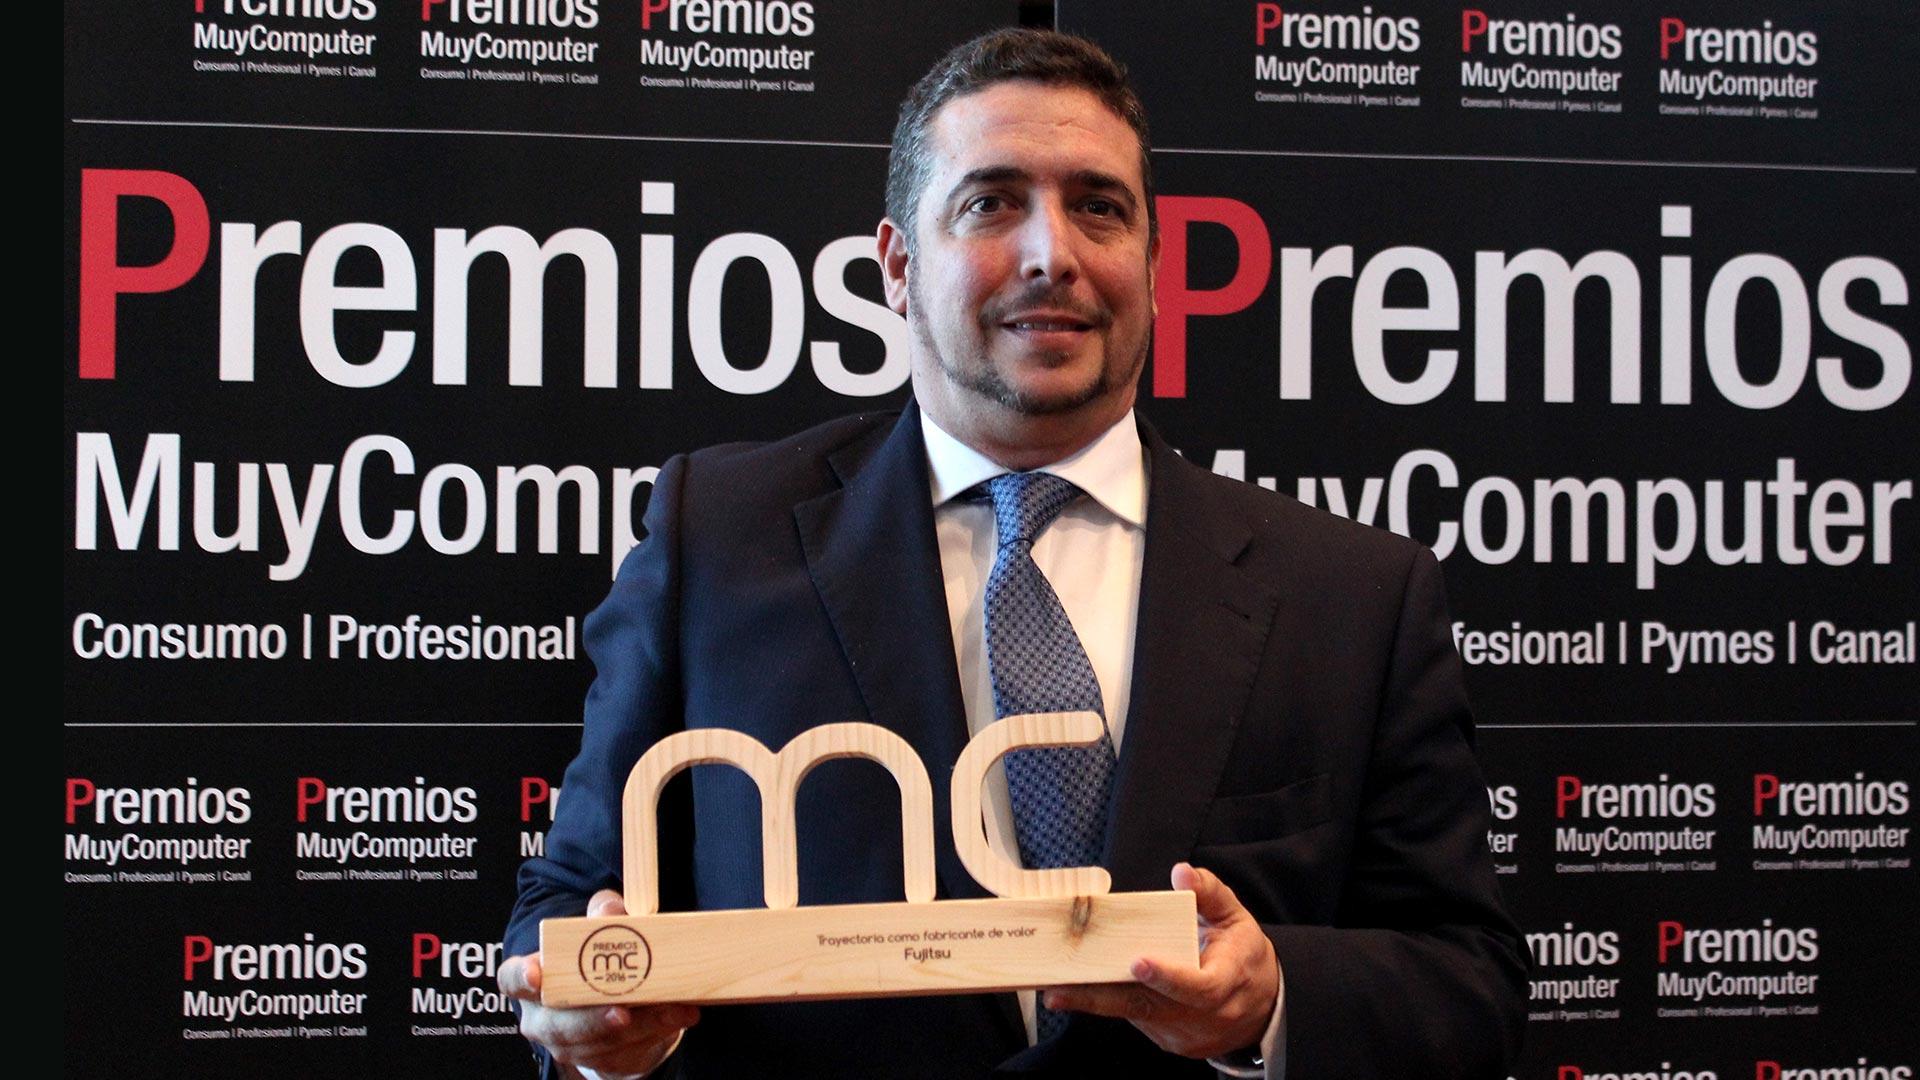 premiosmc2016-trayectoria-fabricante-valor-fujitsu